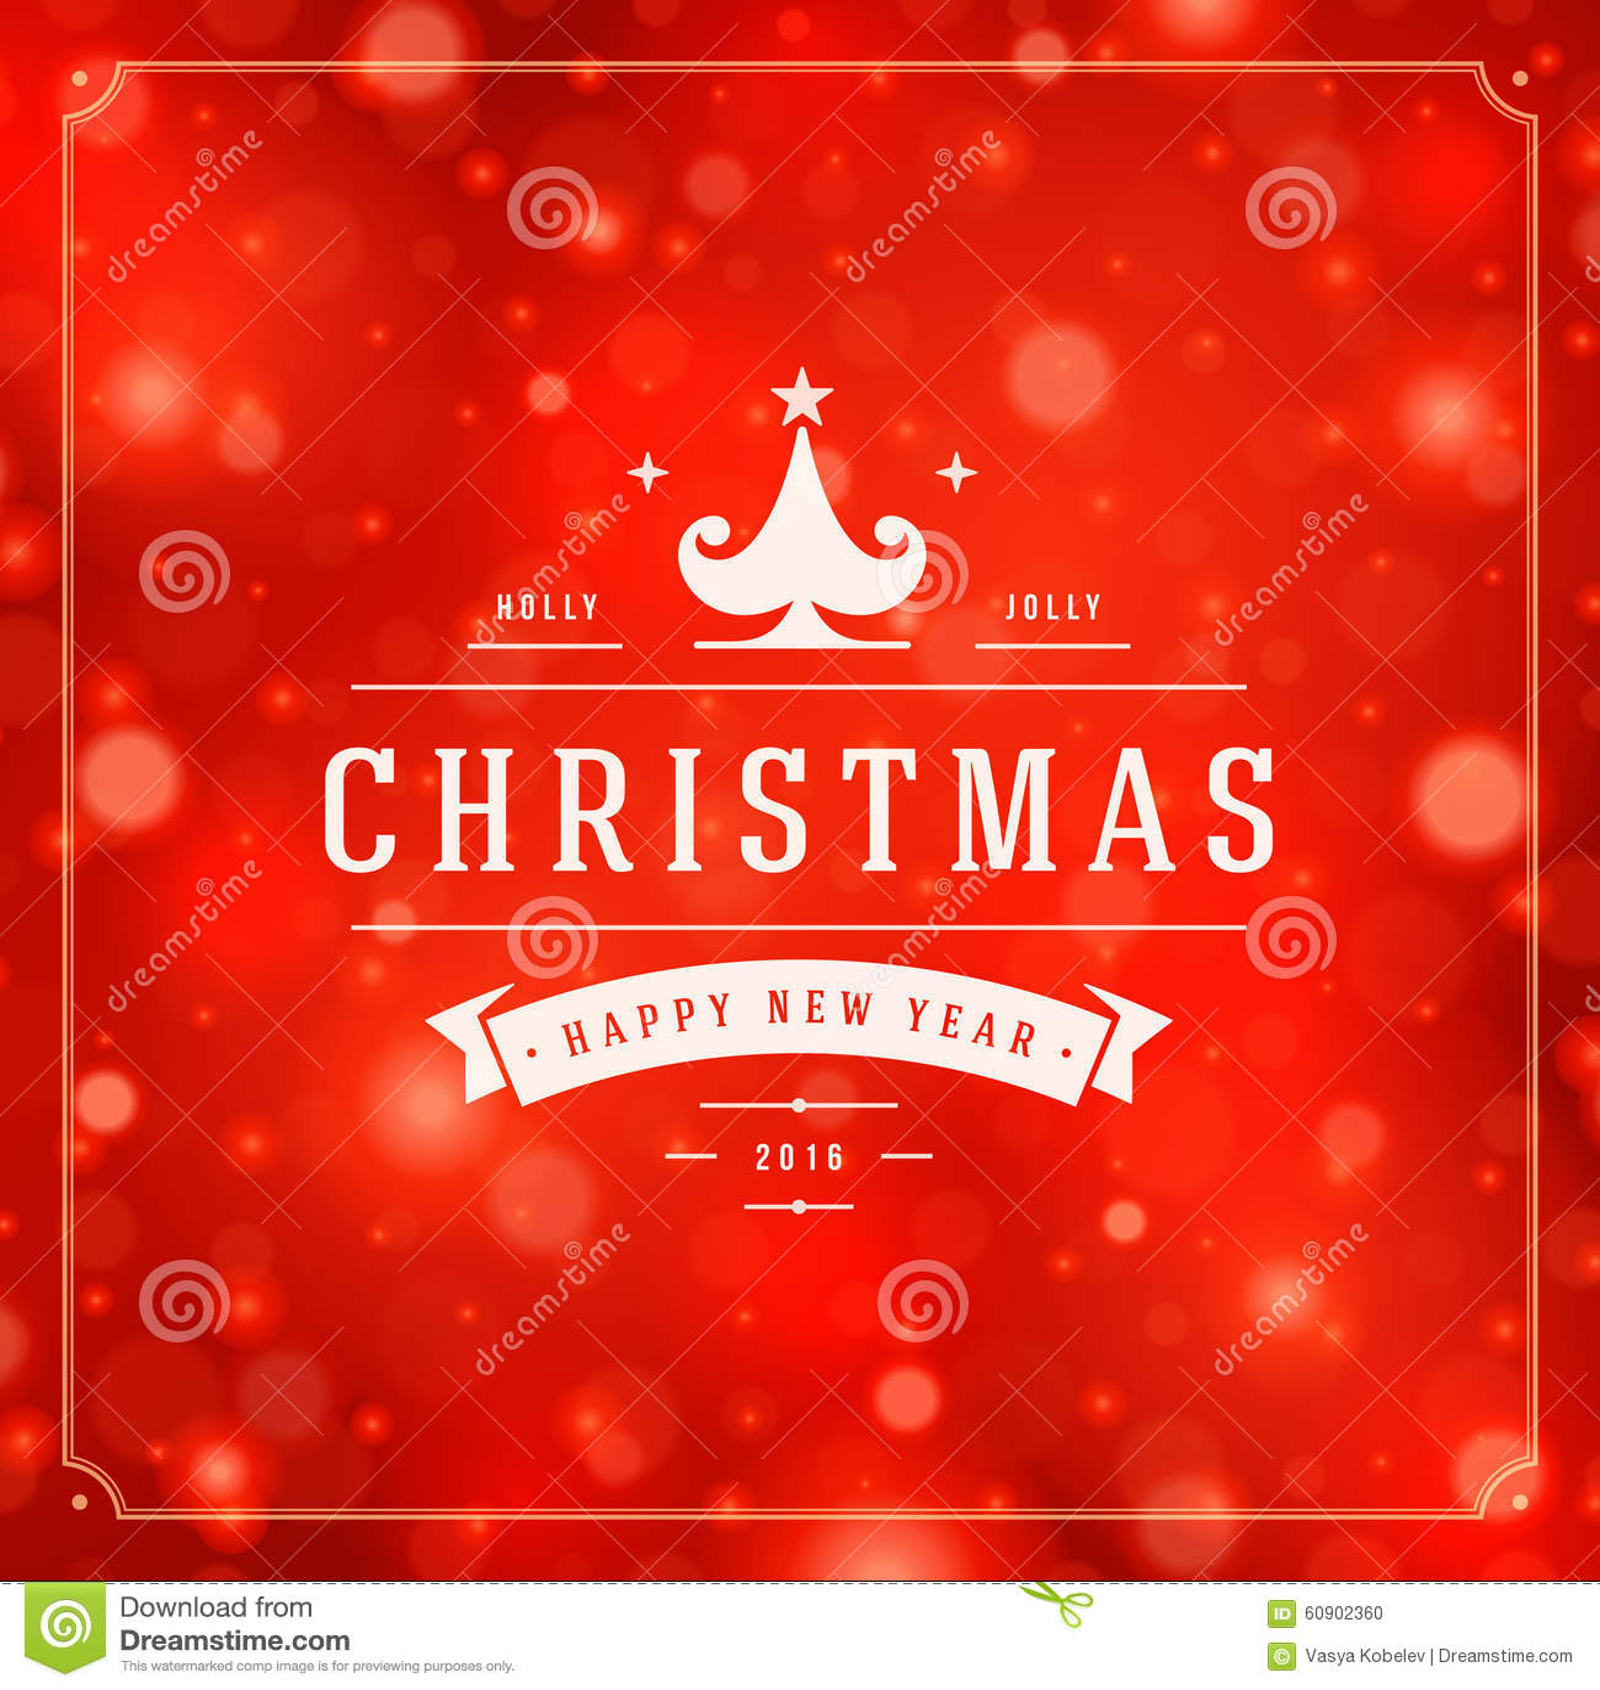 Christmas Greeting Card Lights And Snowflakes Stock Vector